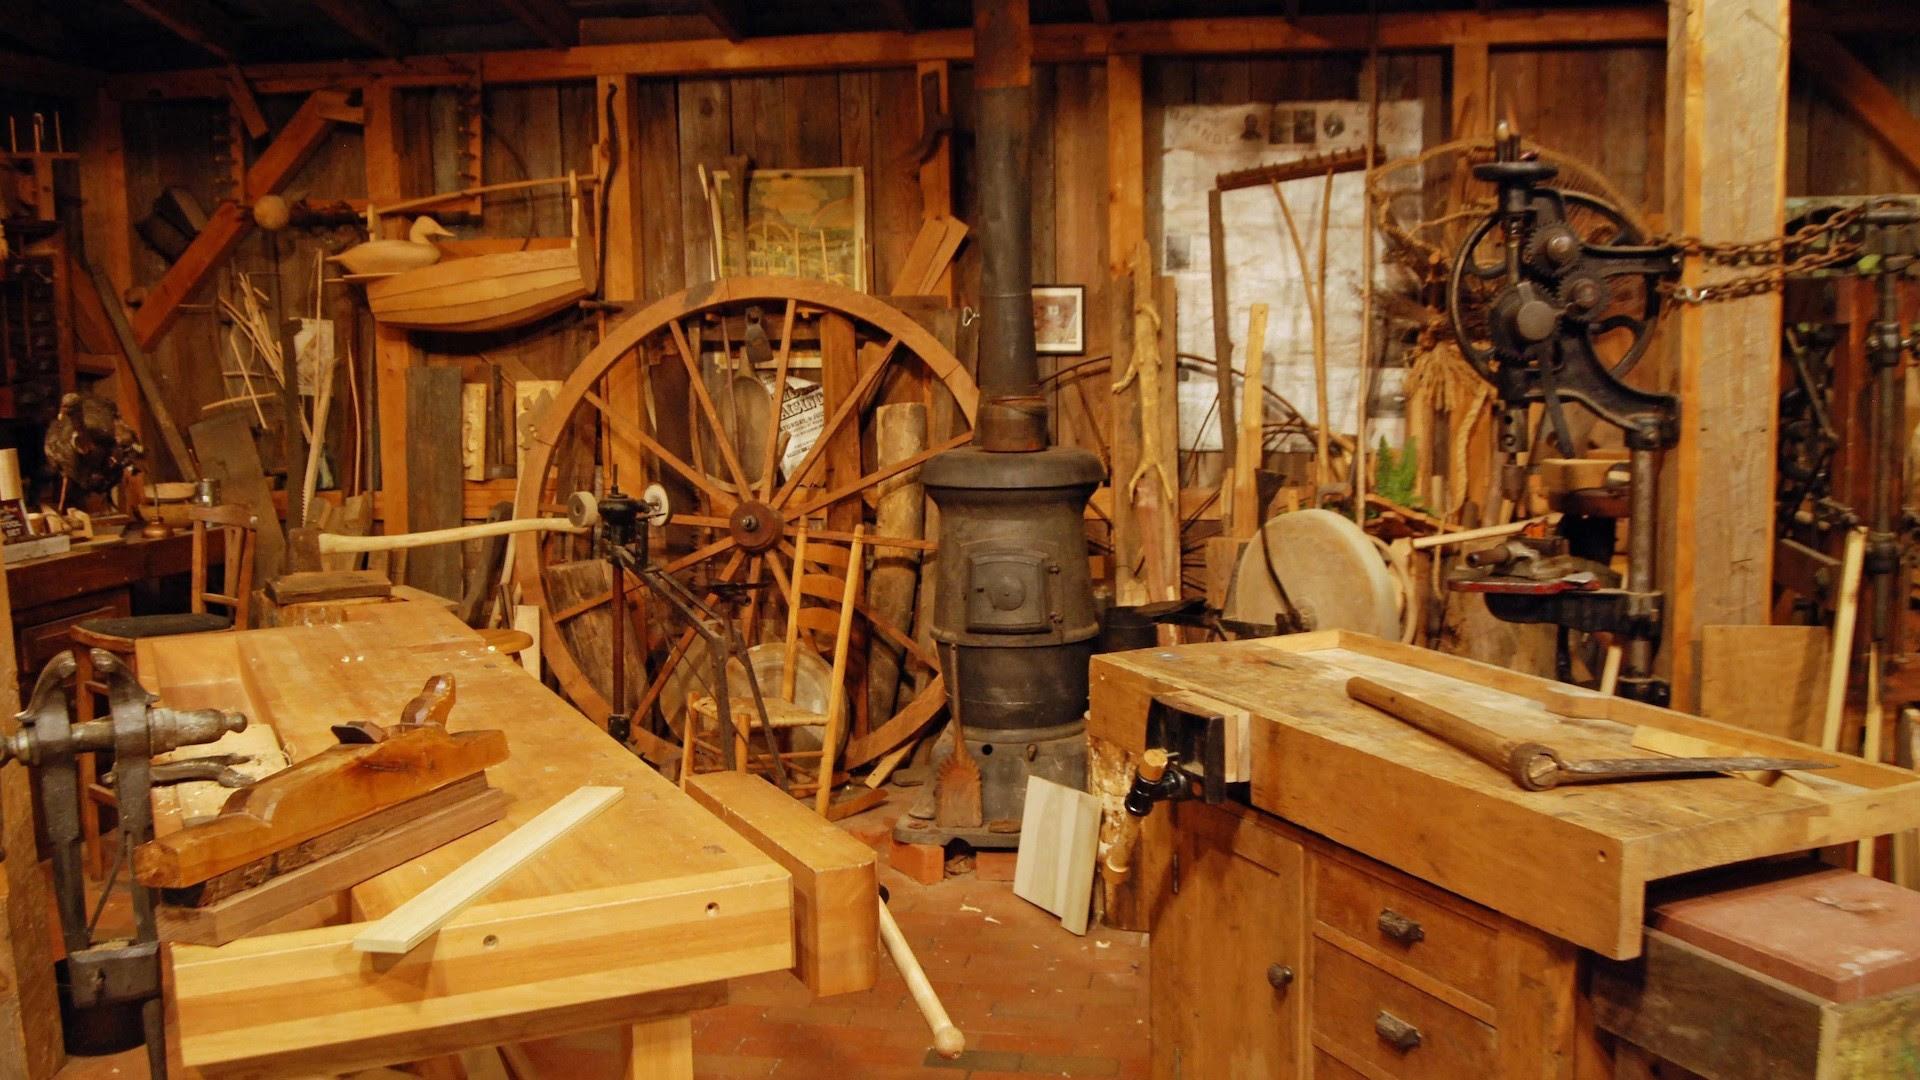 Woodworking Equipment Repair Near Me - ofwoodworking